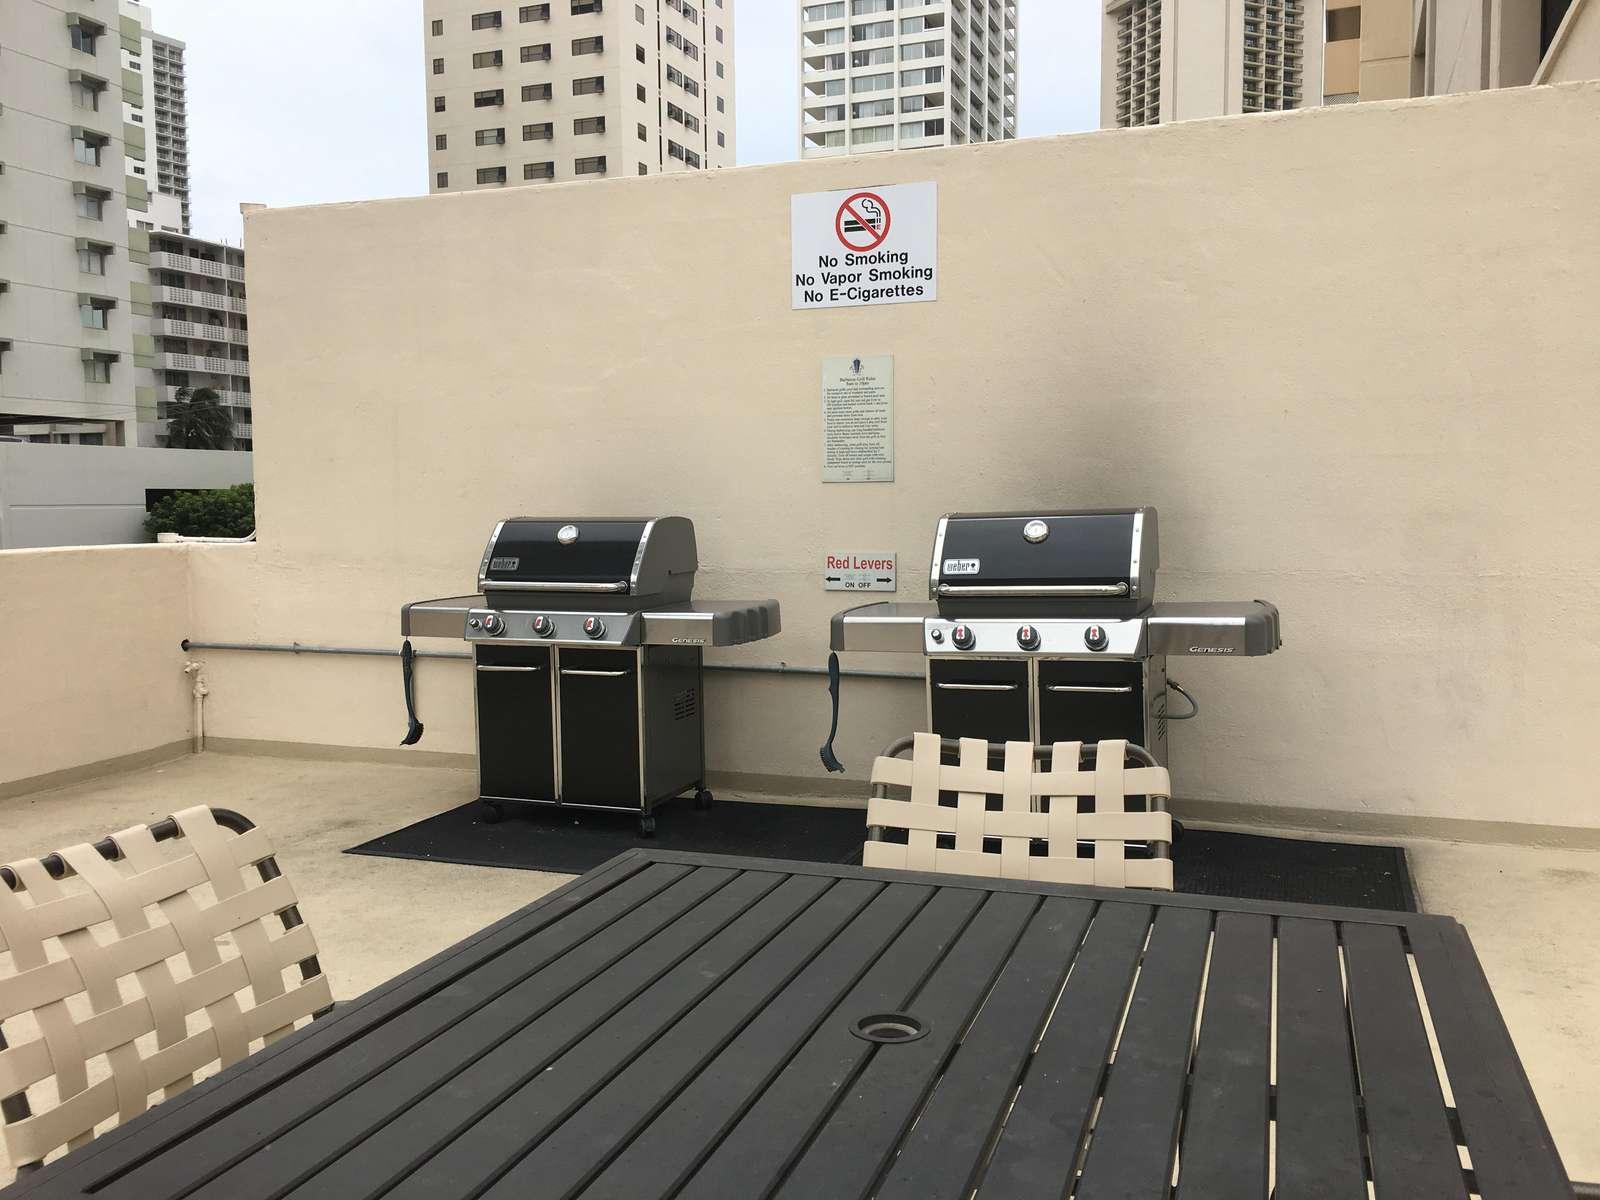 Communal BBQs